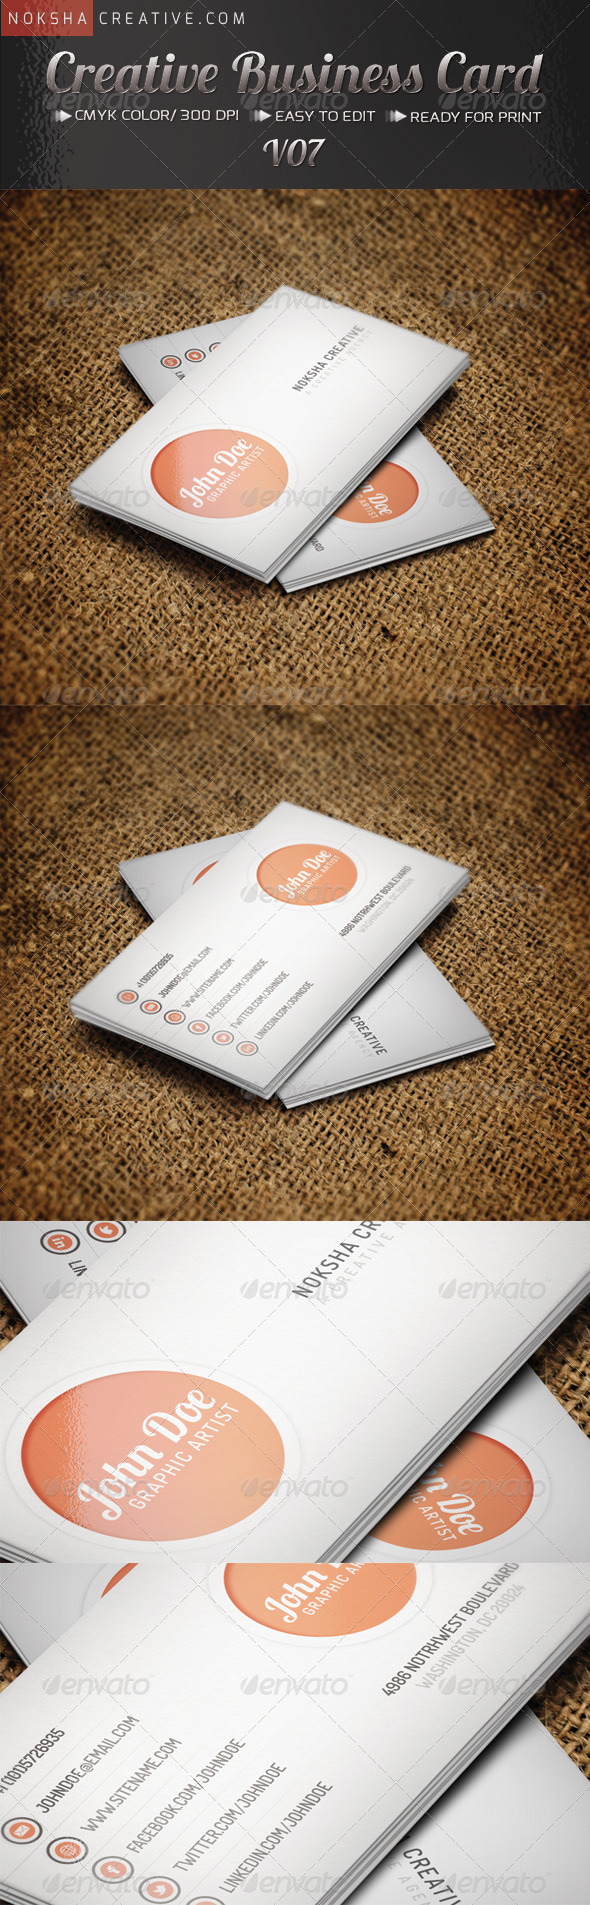 Creative Business Card V07 - Creative Business Cards